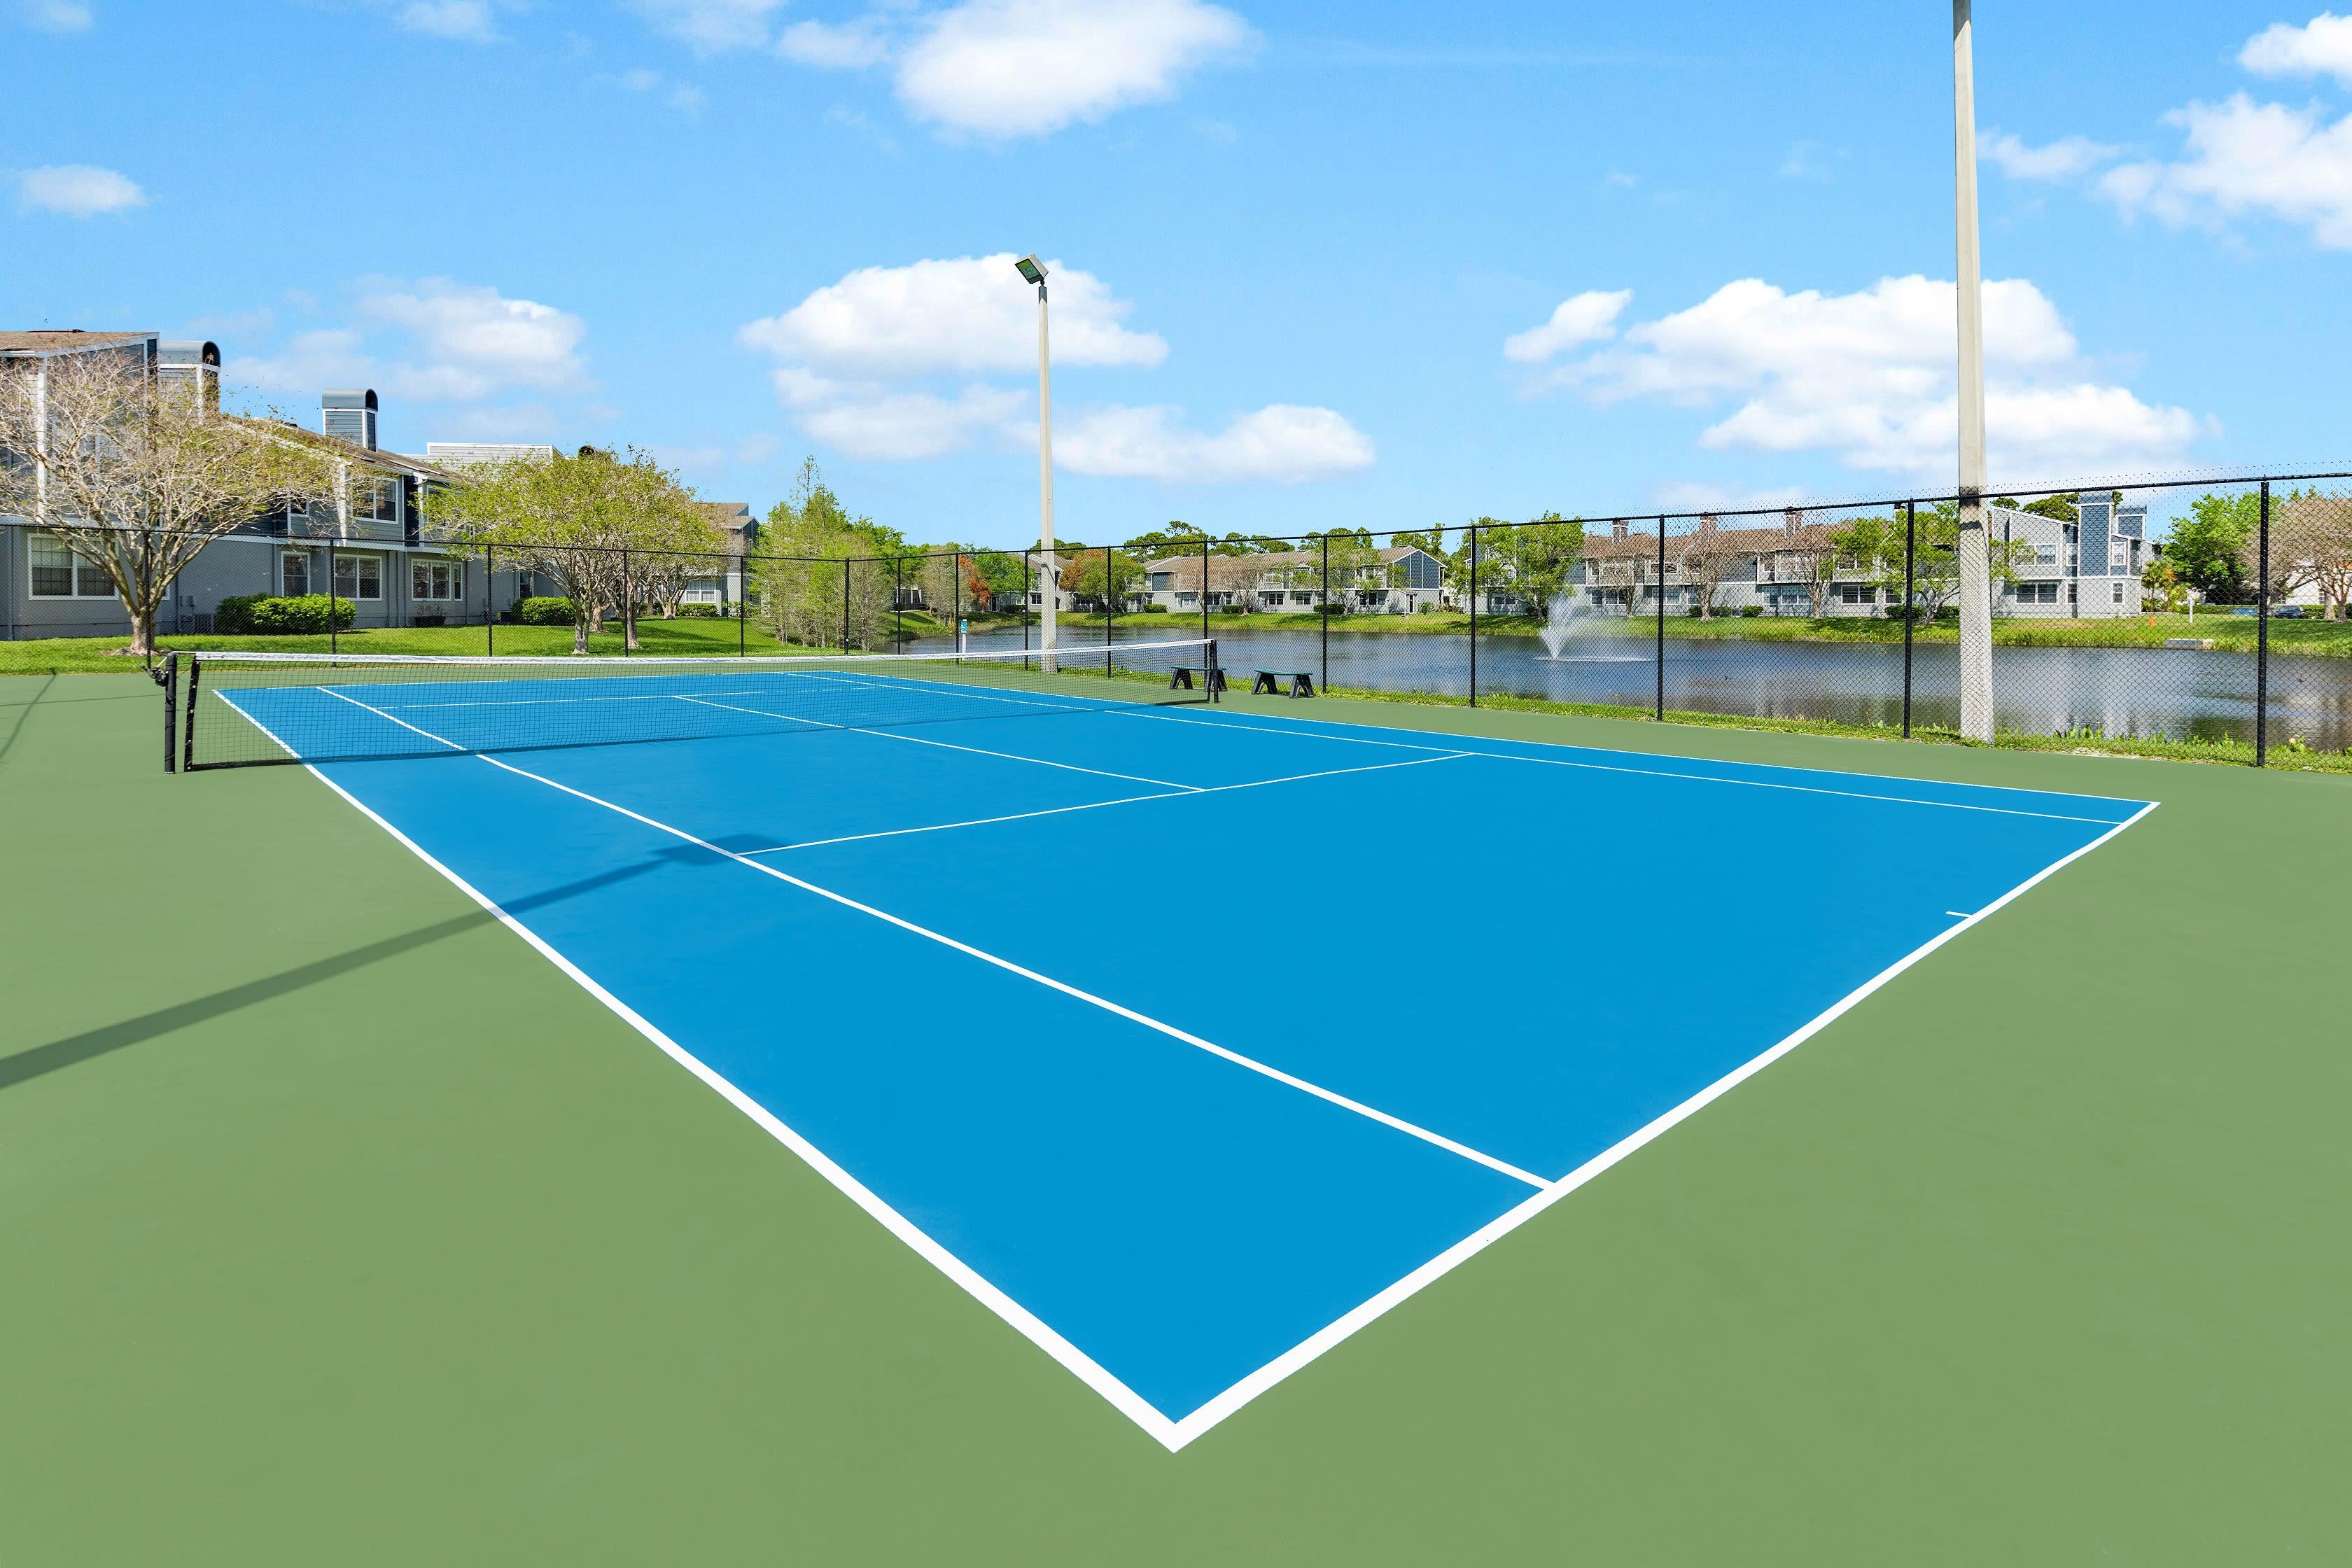 A tennis court at Fairways at Feather Sound in Clearwater, FL